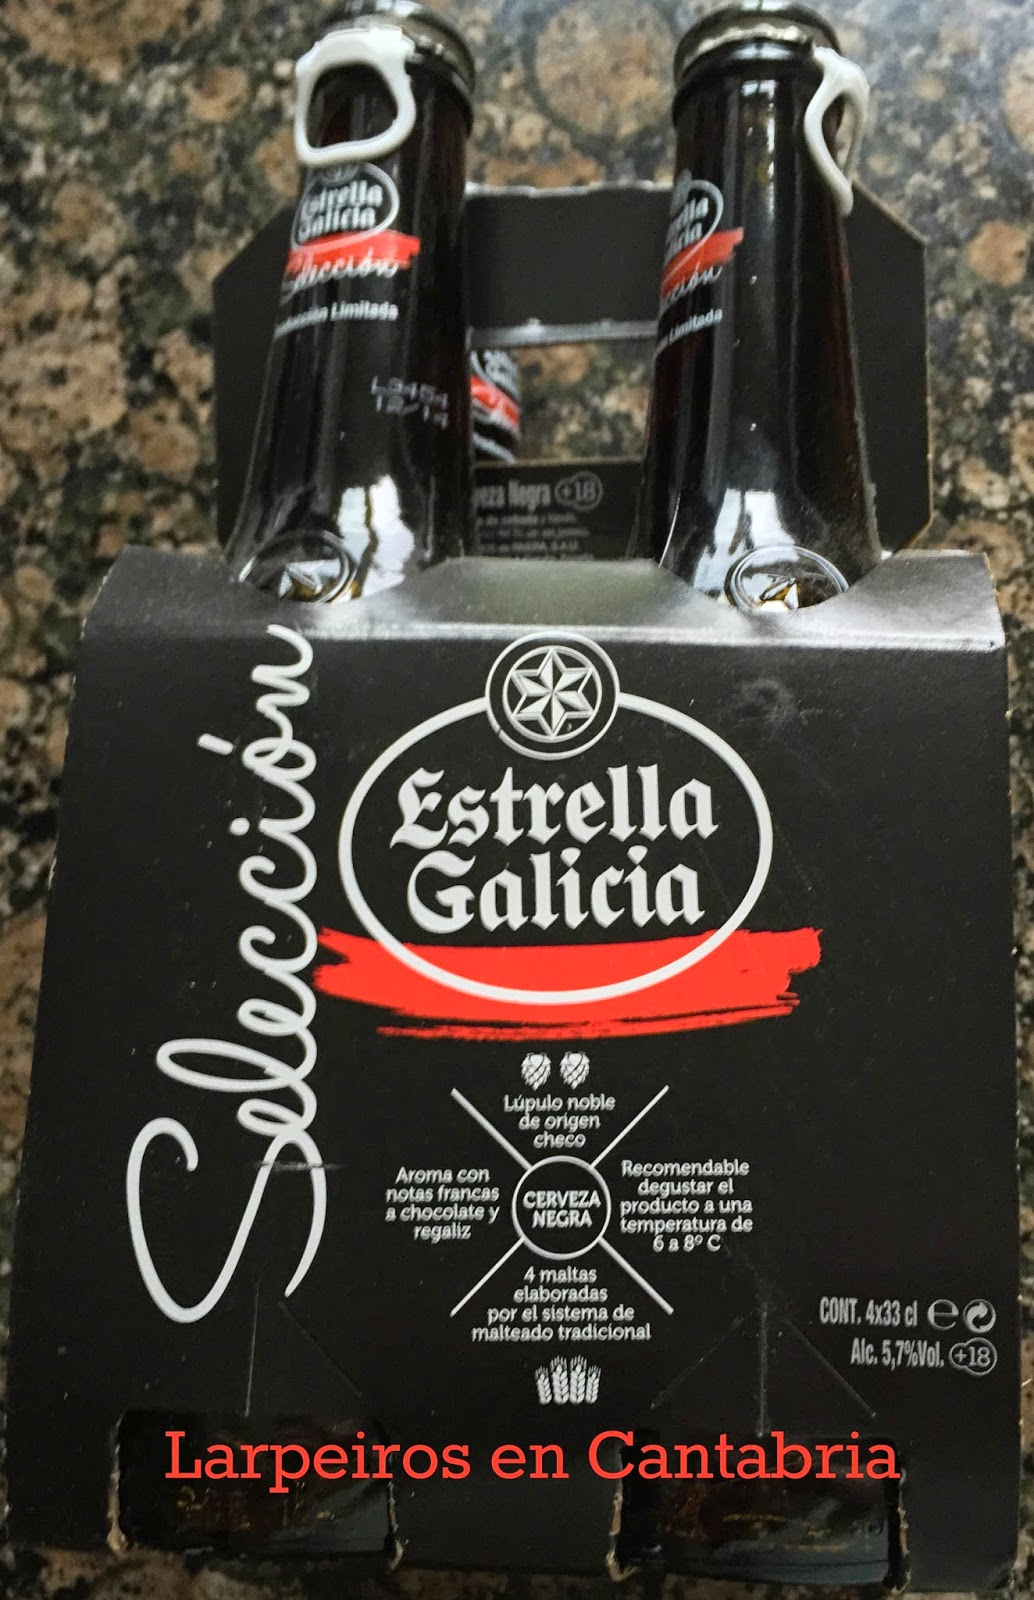 Cerveza Negra Estrella Galicia Selección